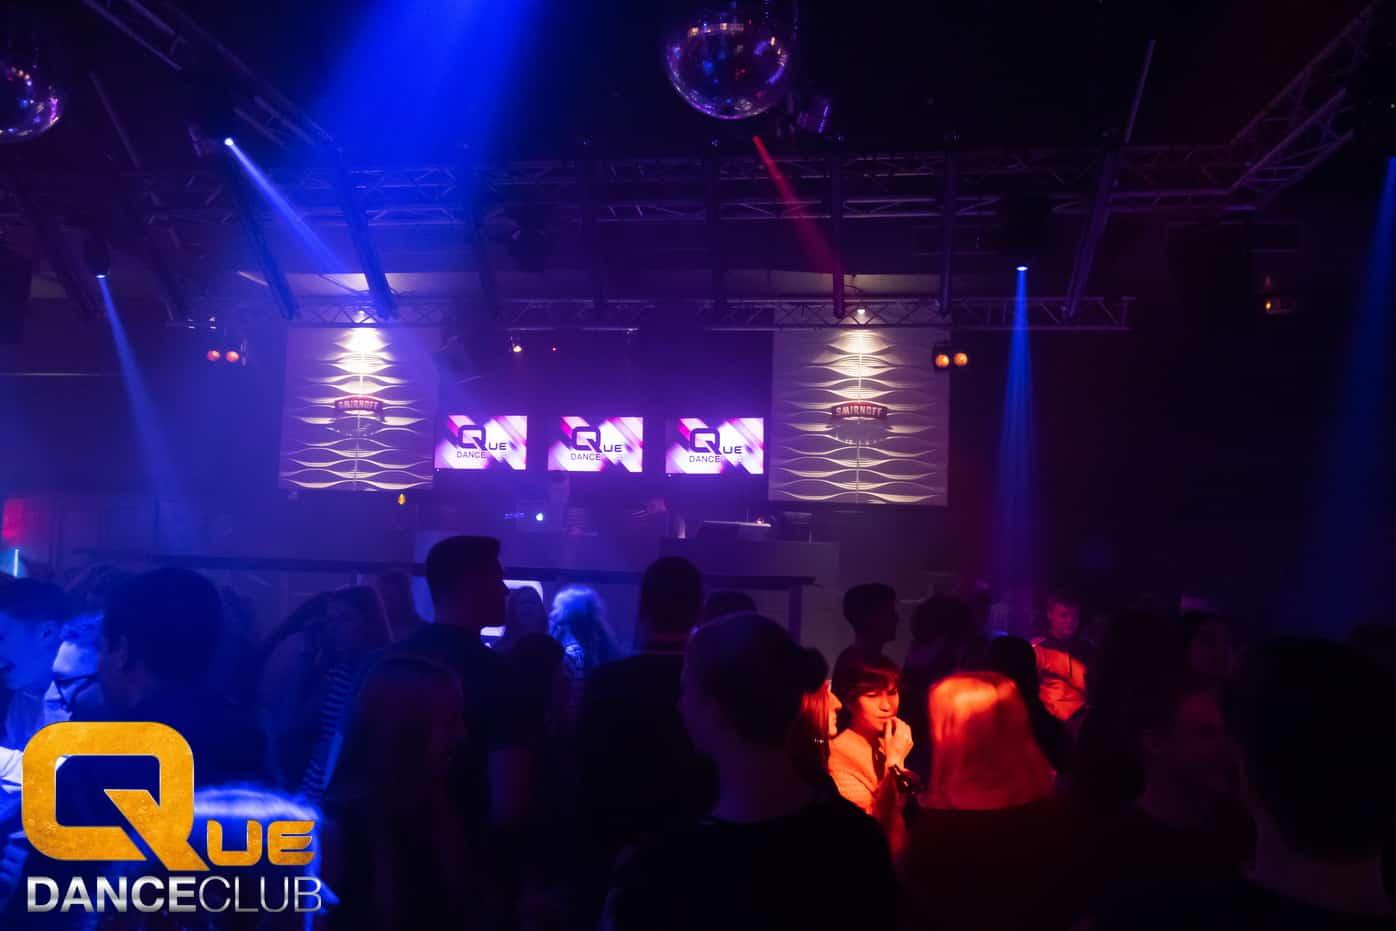 2018_12_20_Que_Danceclub_XMAS_Abiparty_United_Nightlife_Scene_Timo_017